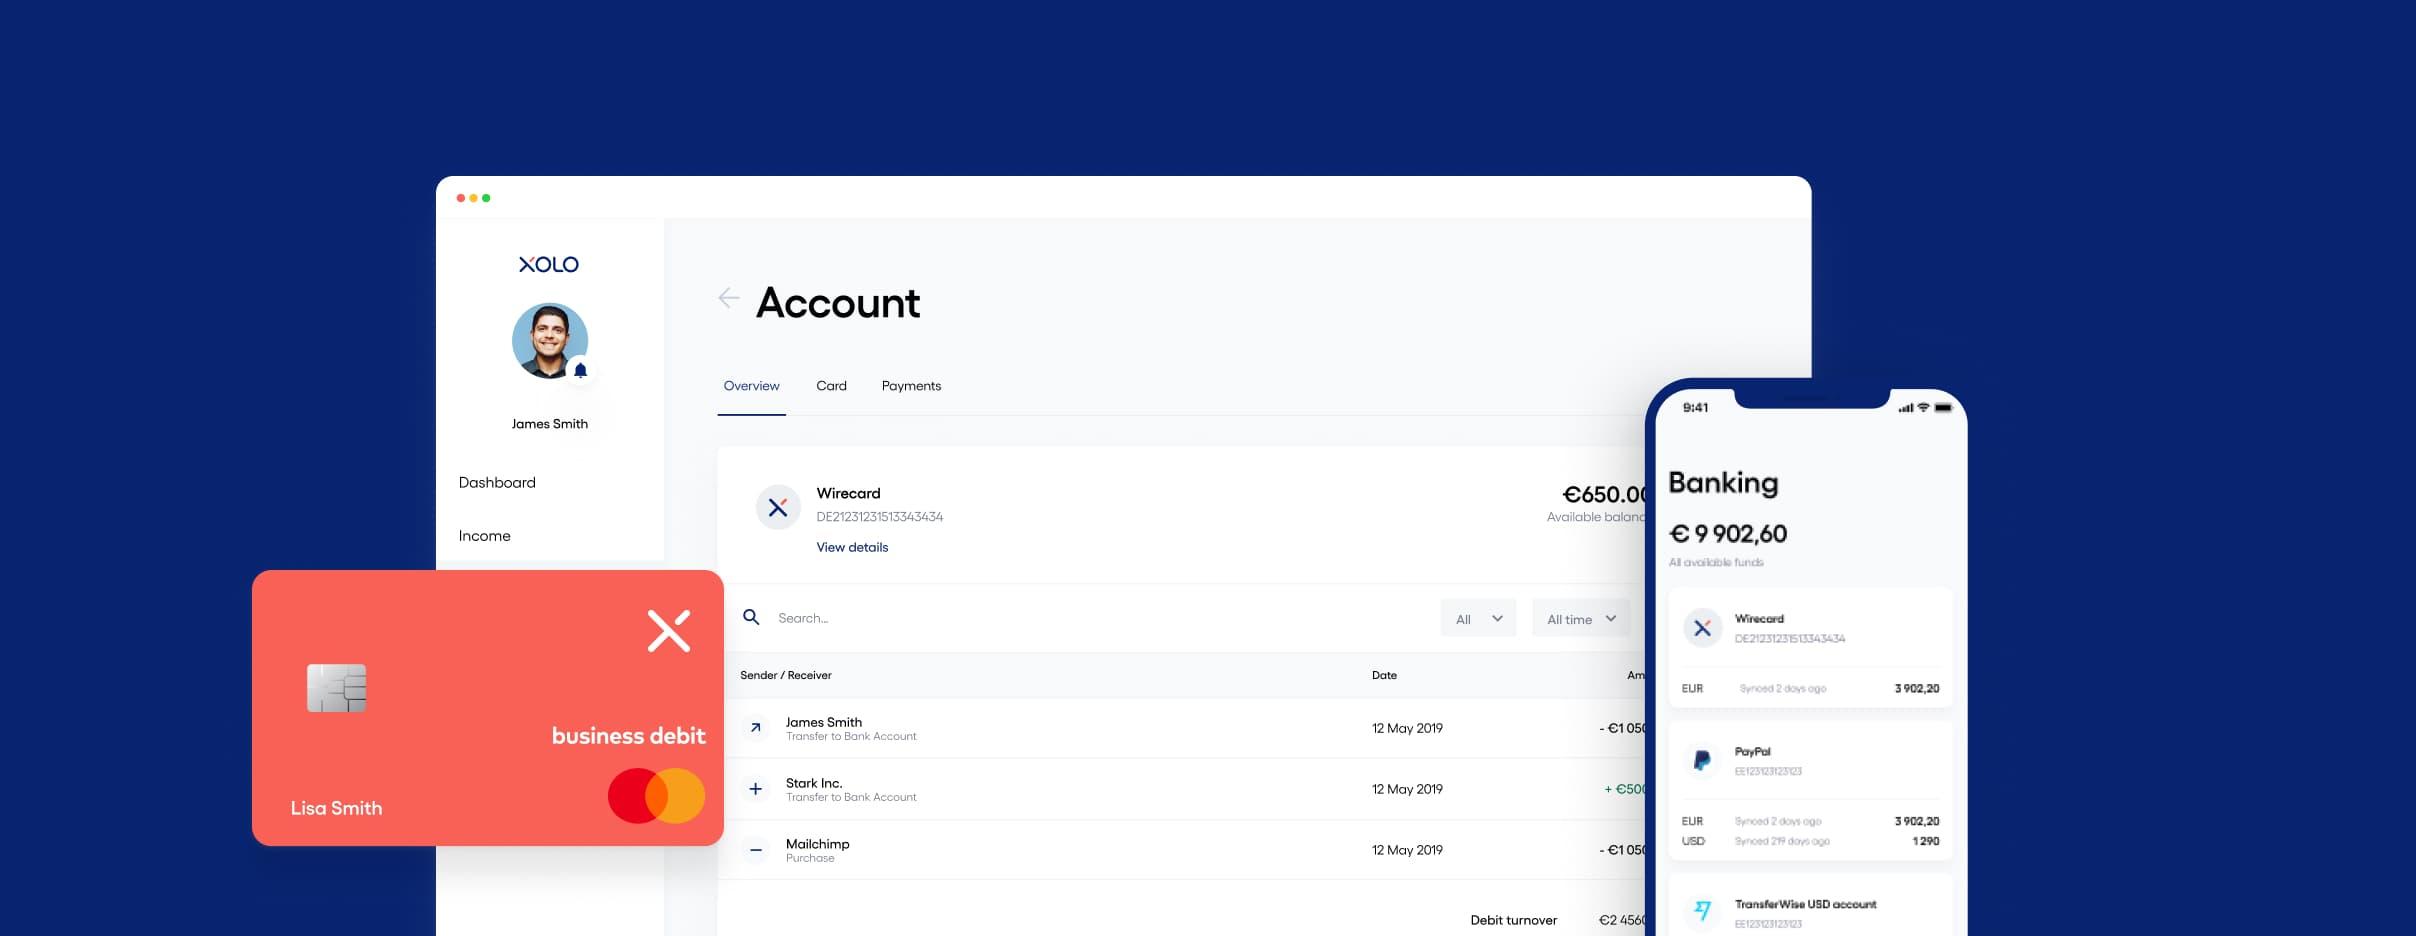 Image of Xolo's bank account